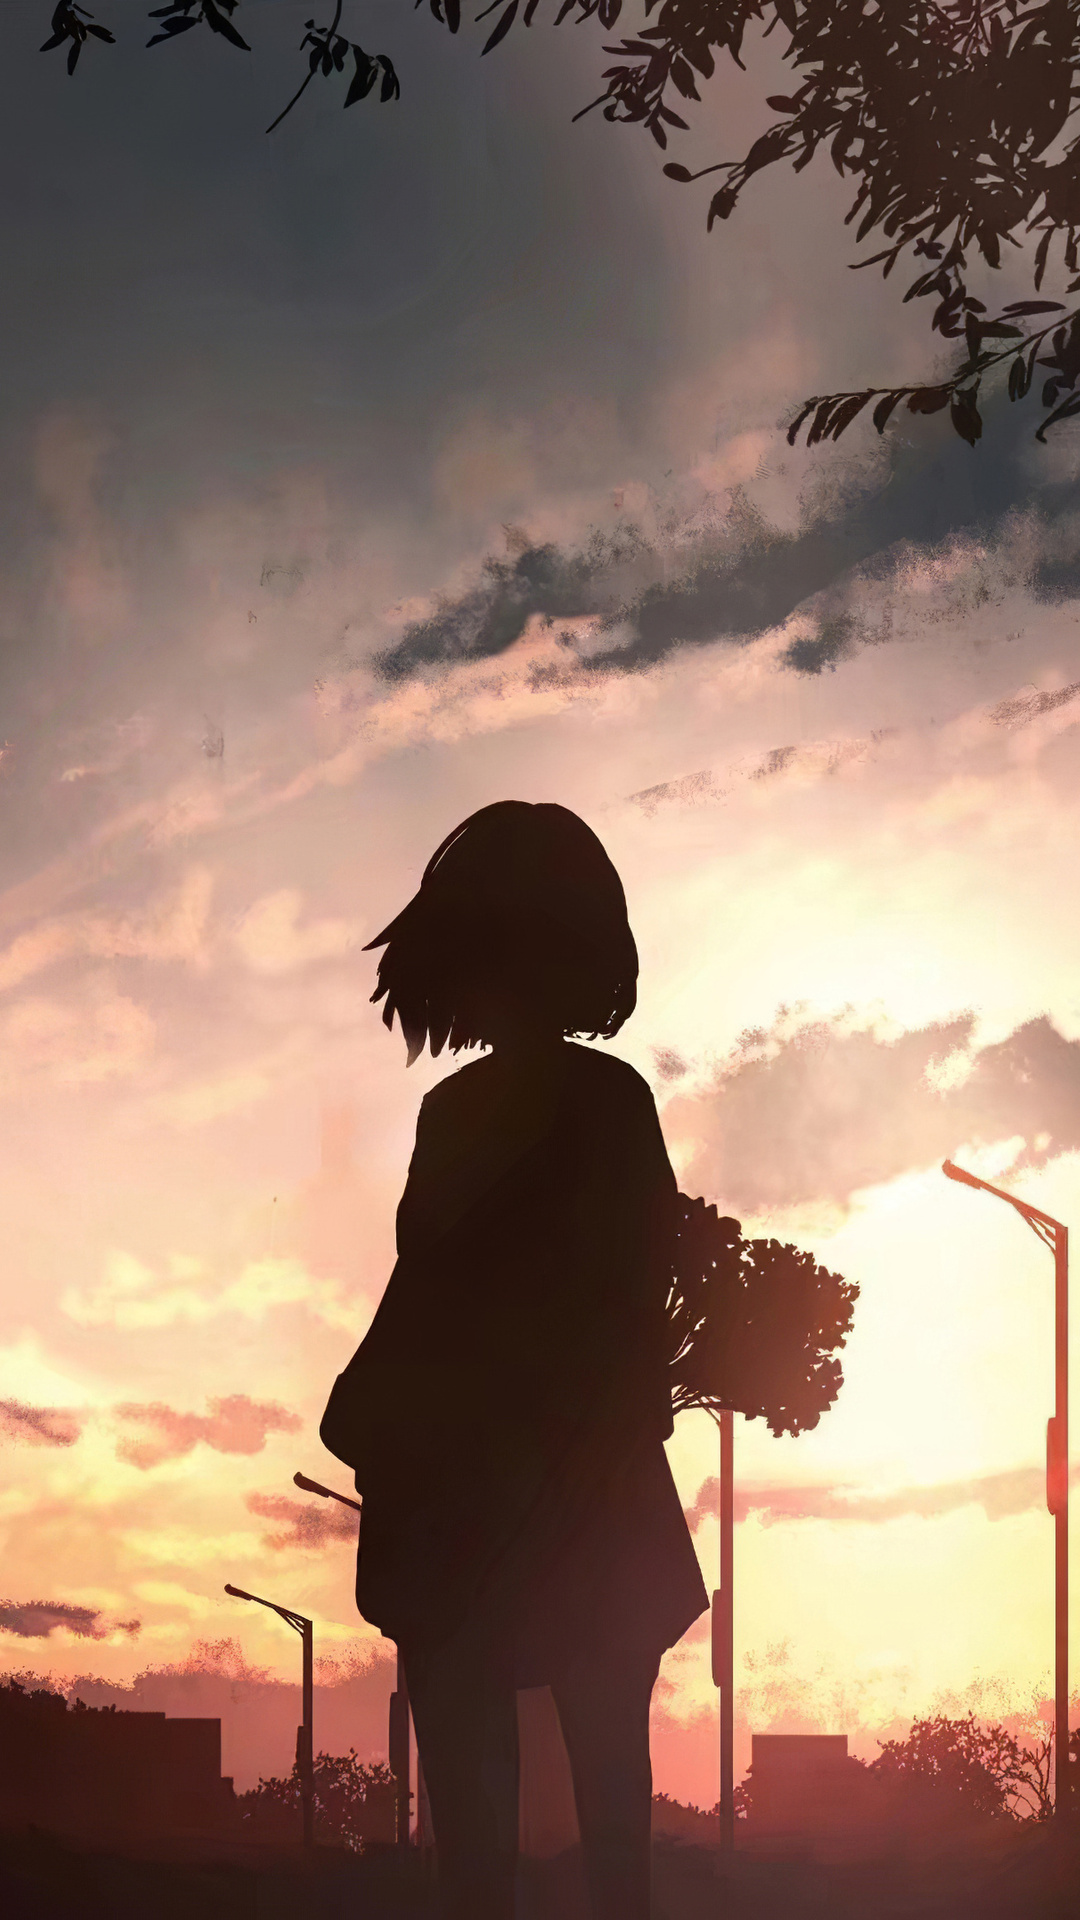 anime-girl-with-flowers-looking-towards-sunset-2j.jpg